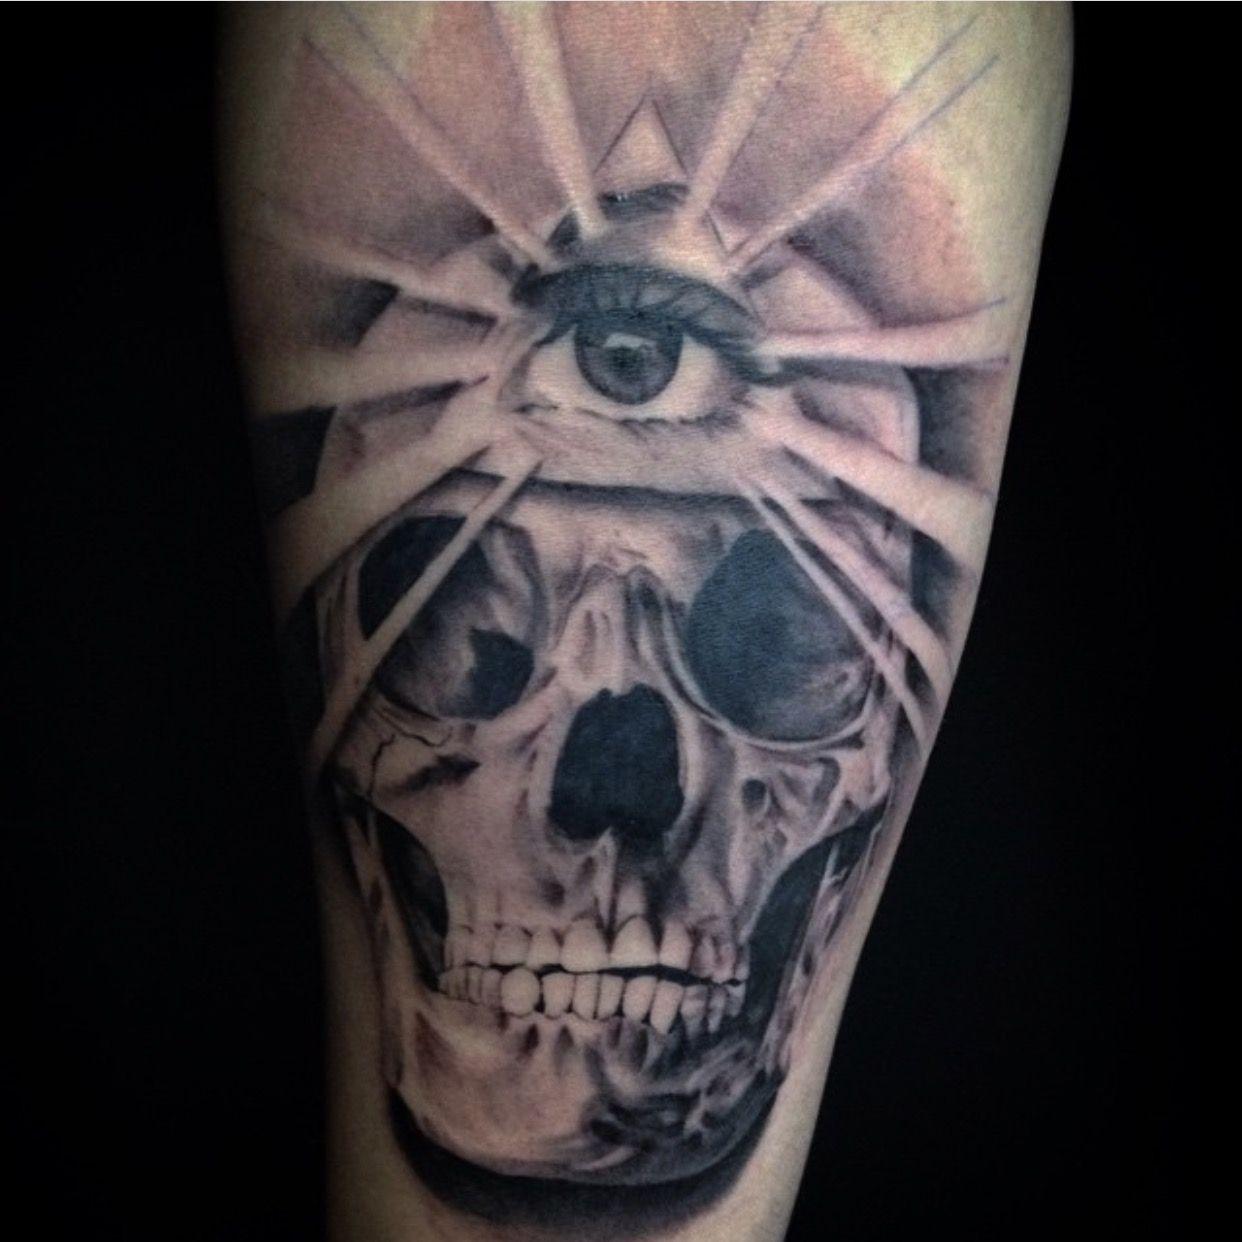 Third Eye Tattoo: Third Eye Tattoo Skull Black And Grey